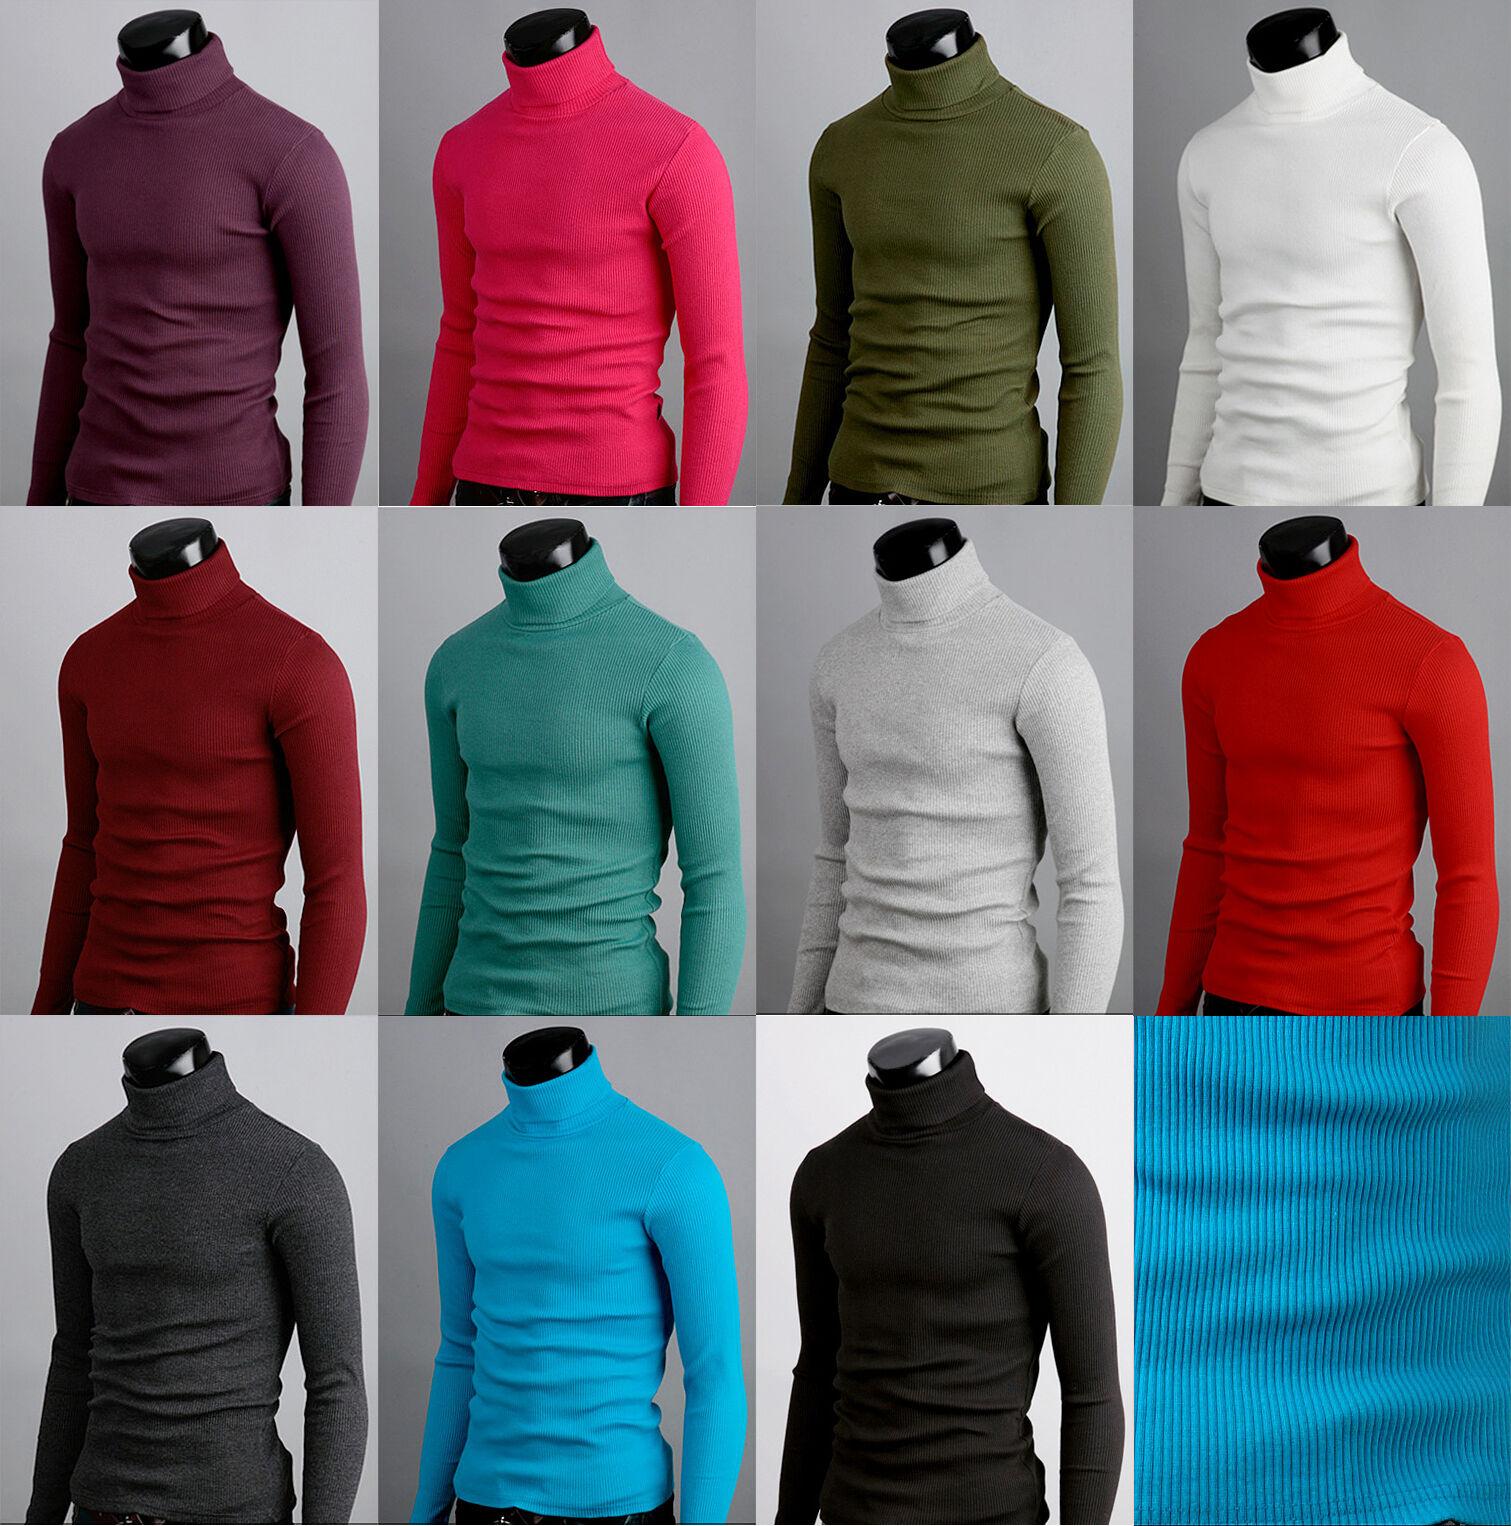 Korean fashion Mens Turtleneck sweatershirts stretch Cotton polo neck jumper